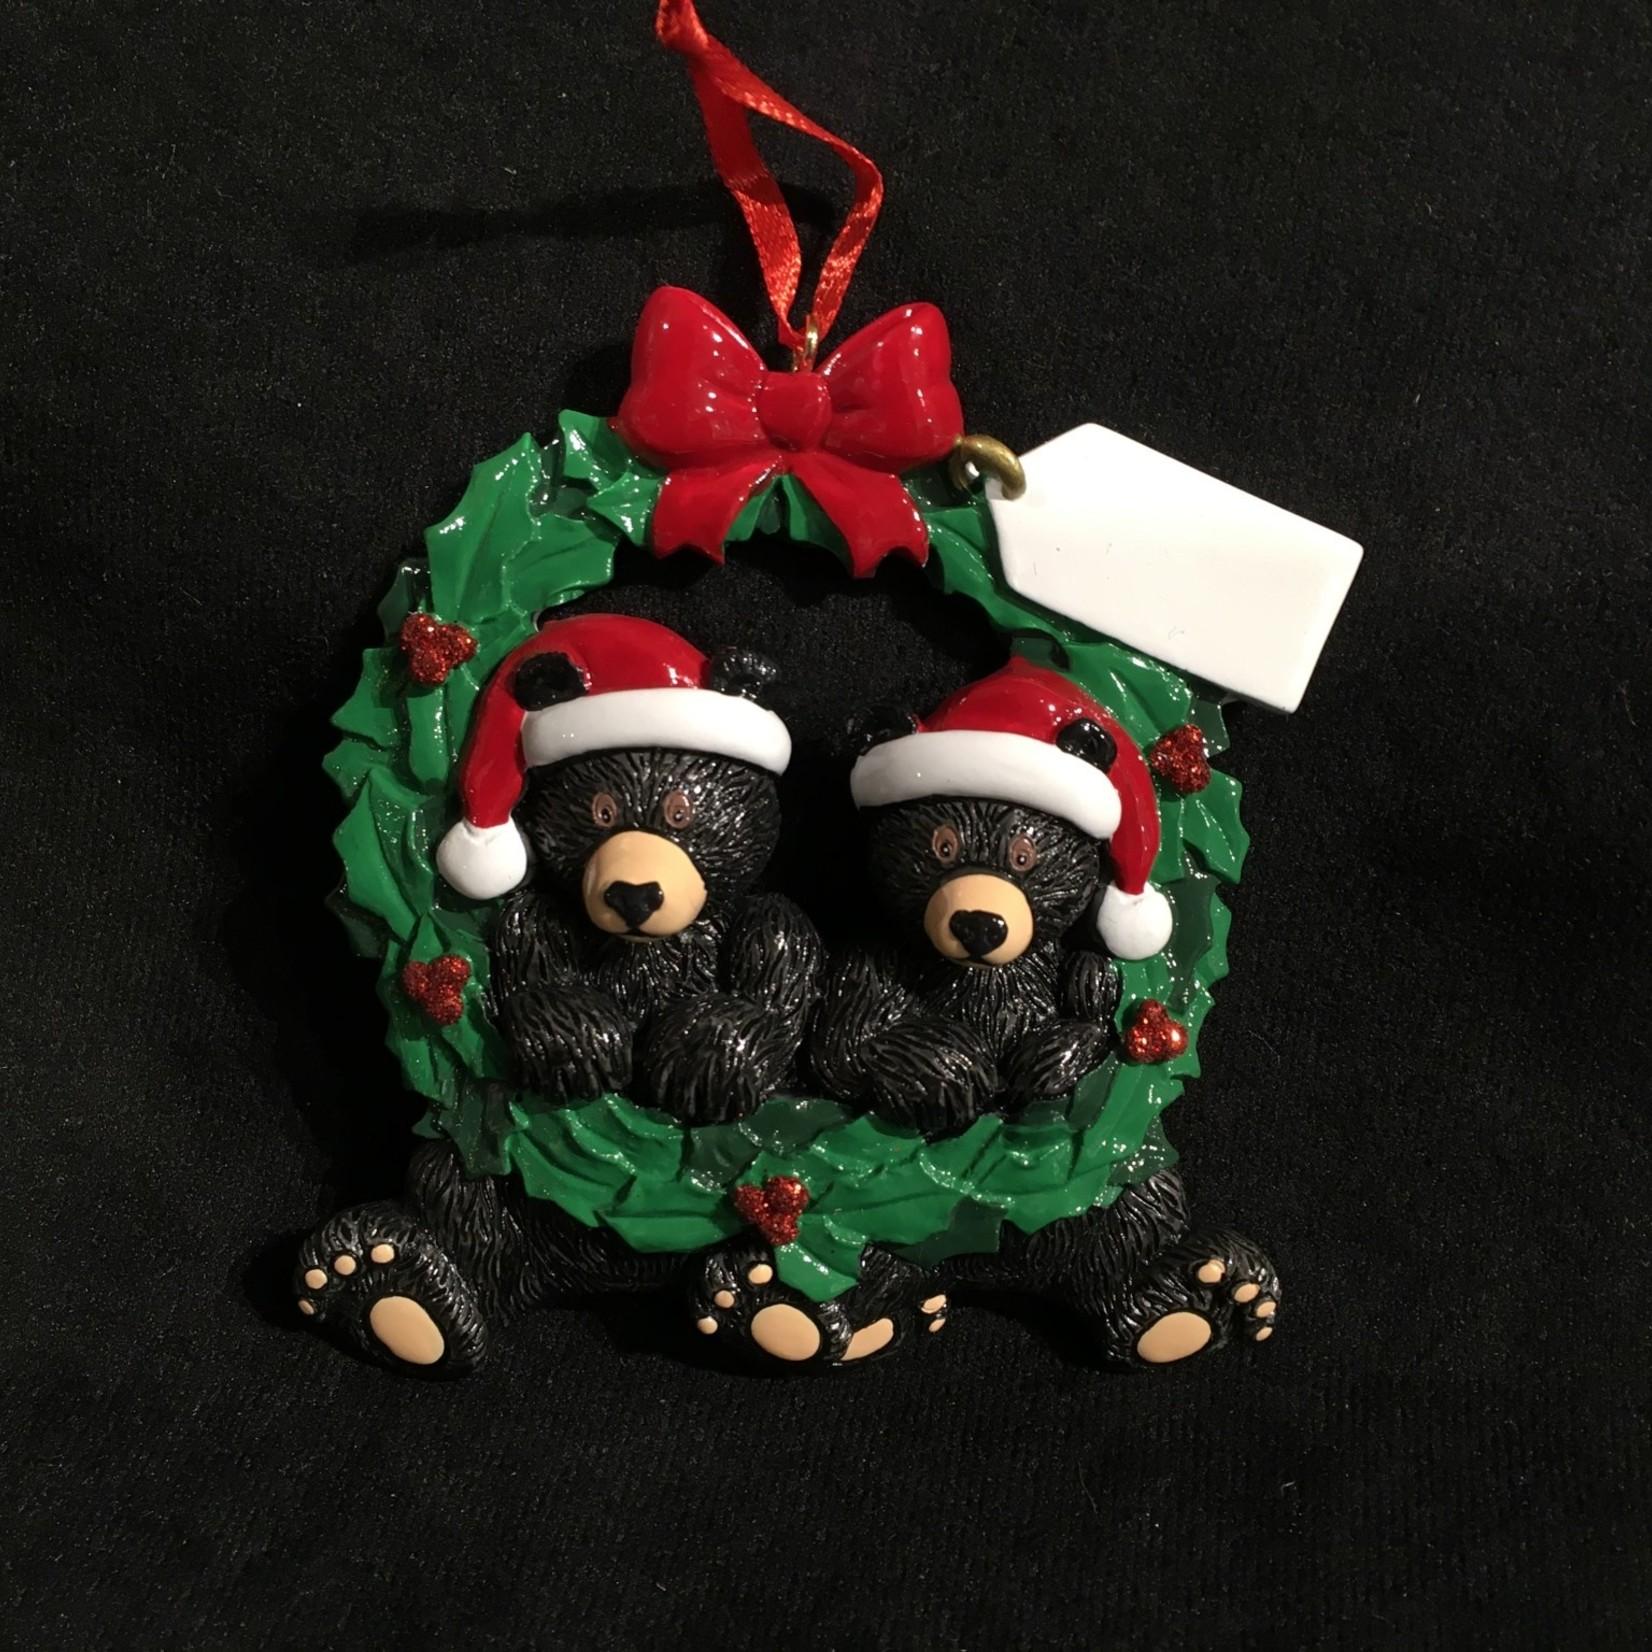 Black Bear Wreath Orn - 2